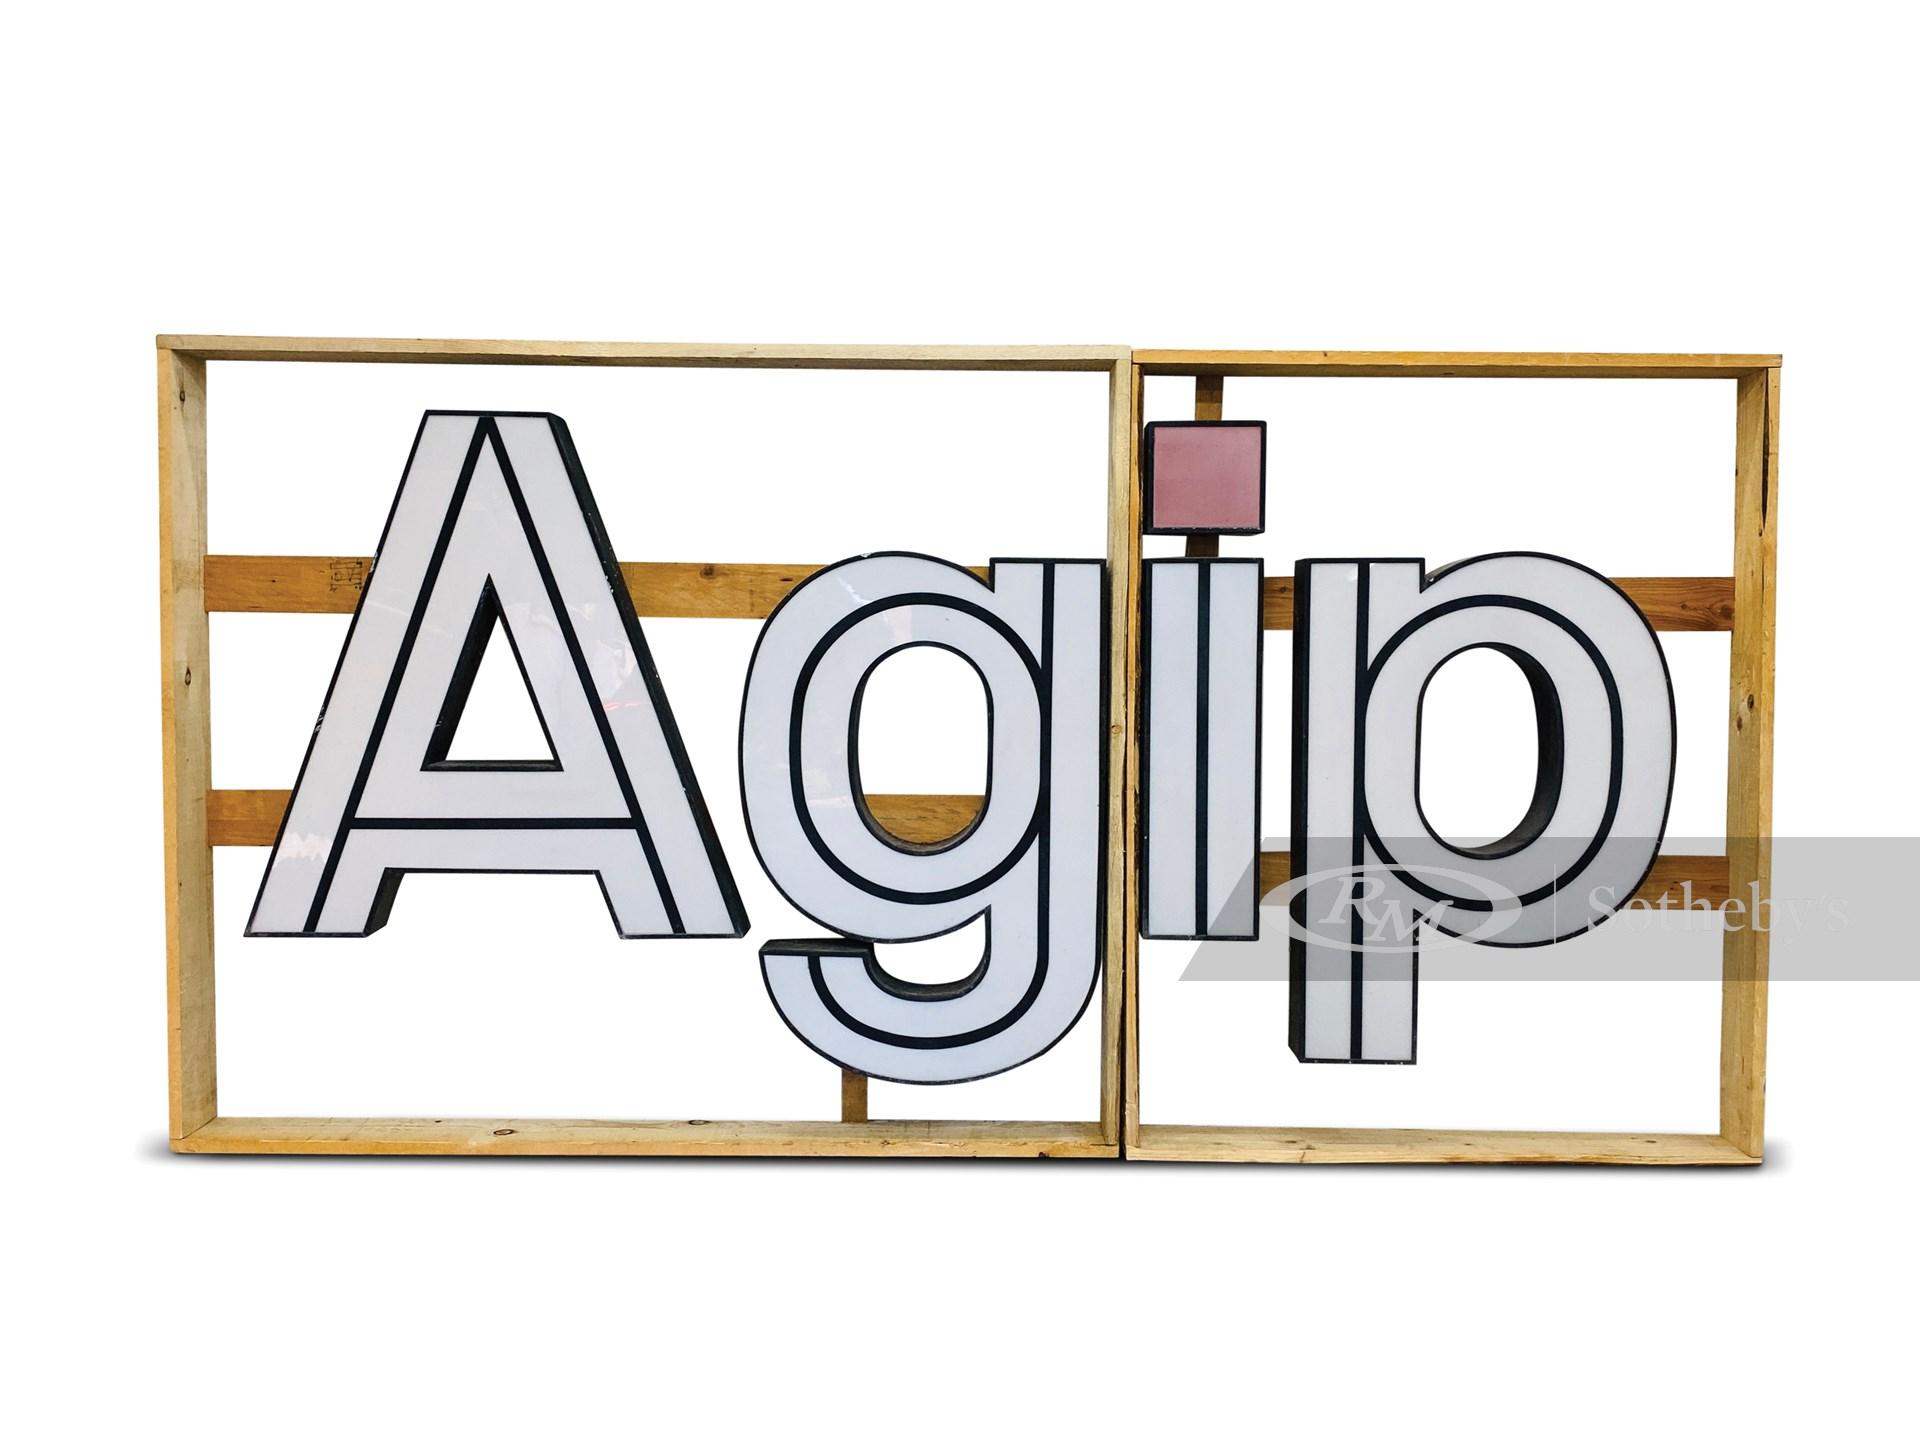 AGIP Illuminated Dealership Sign, ca. 1970s -